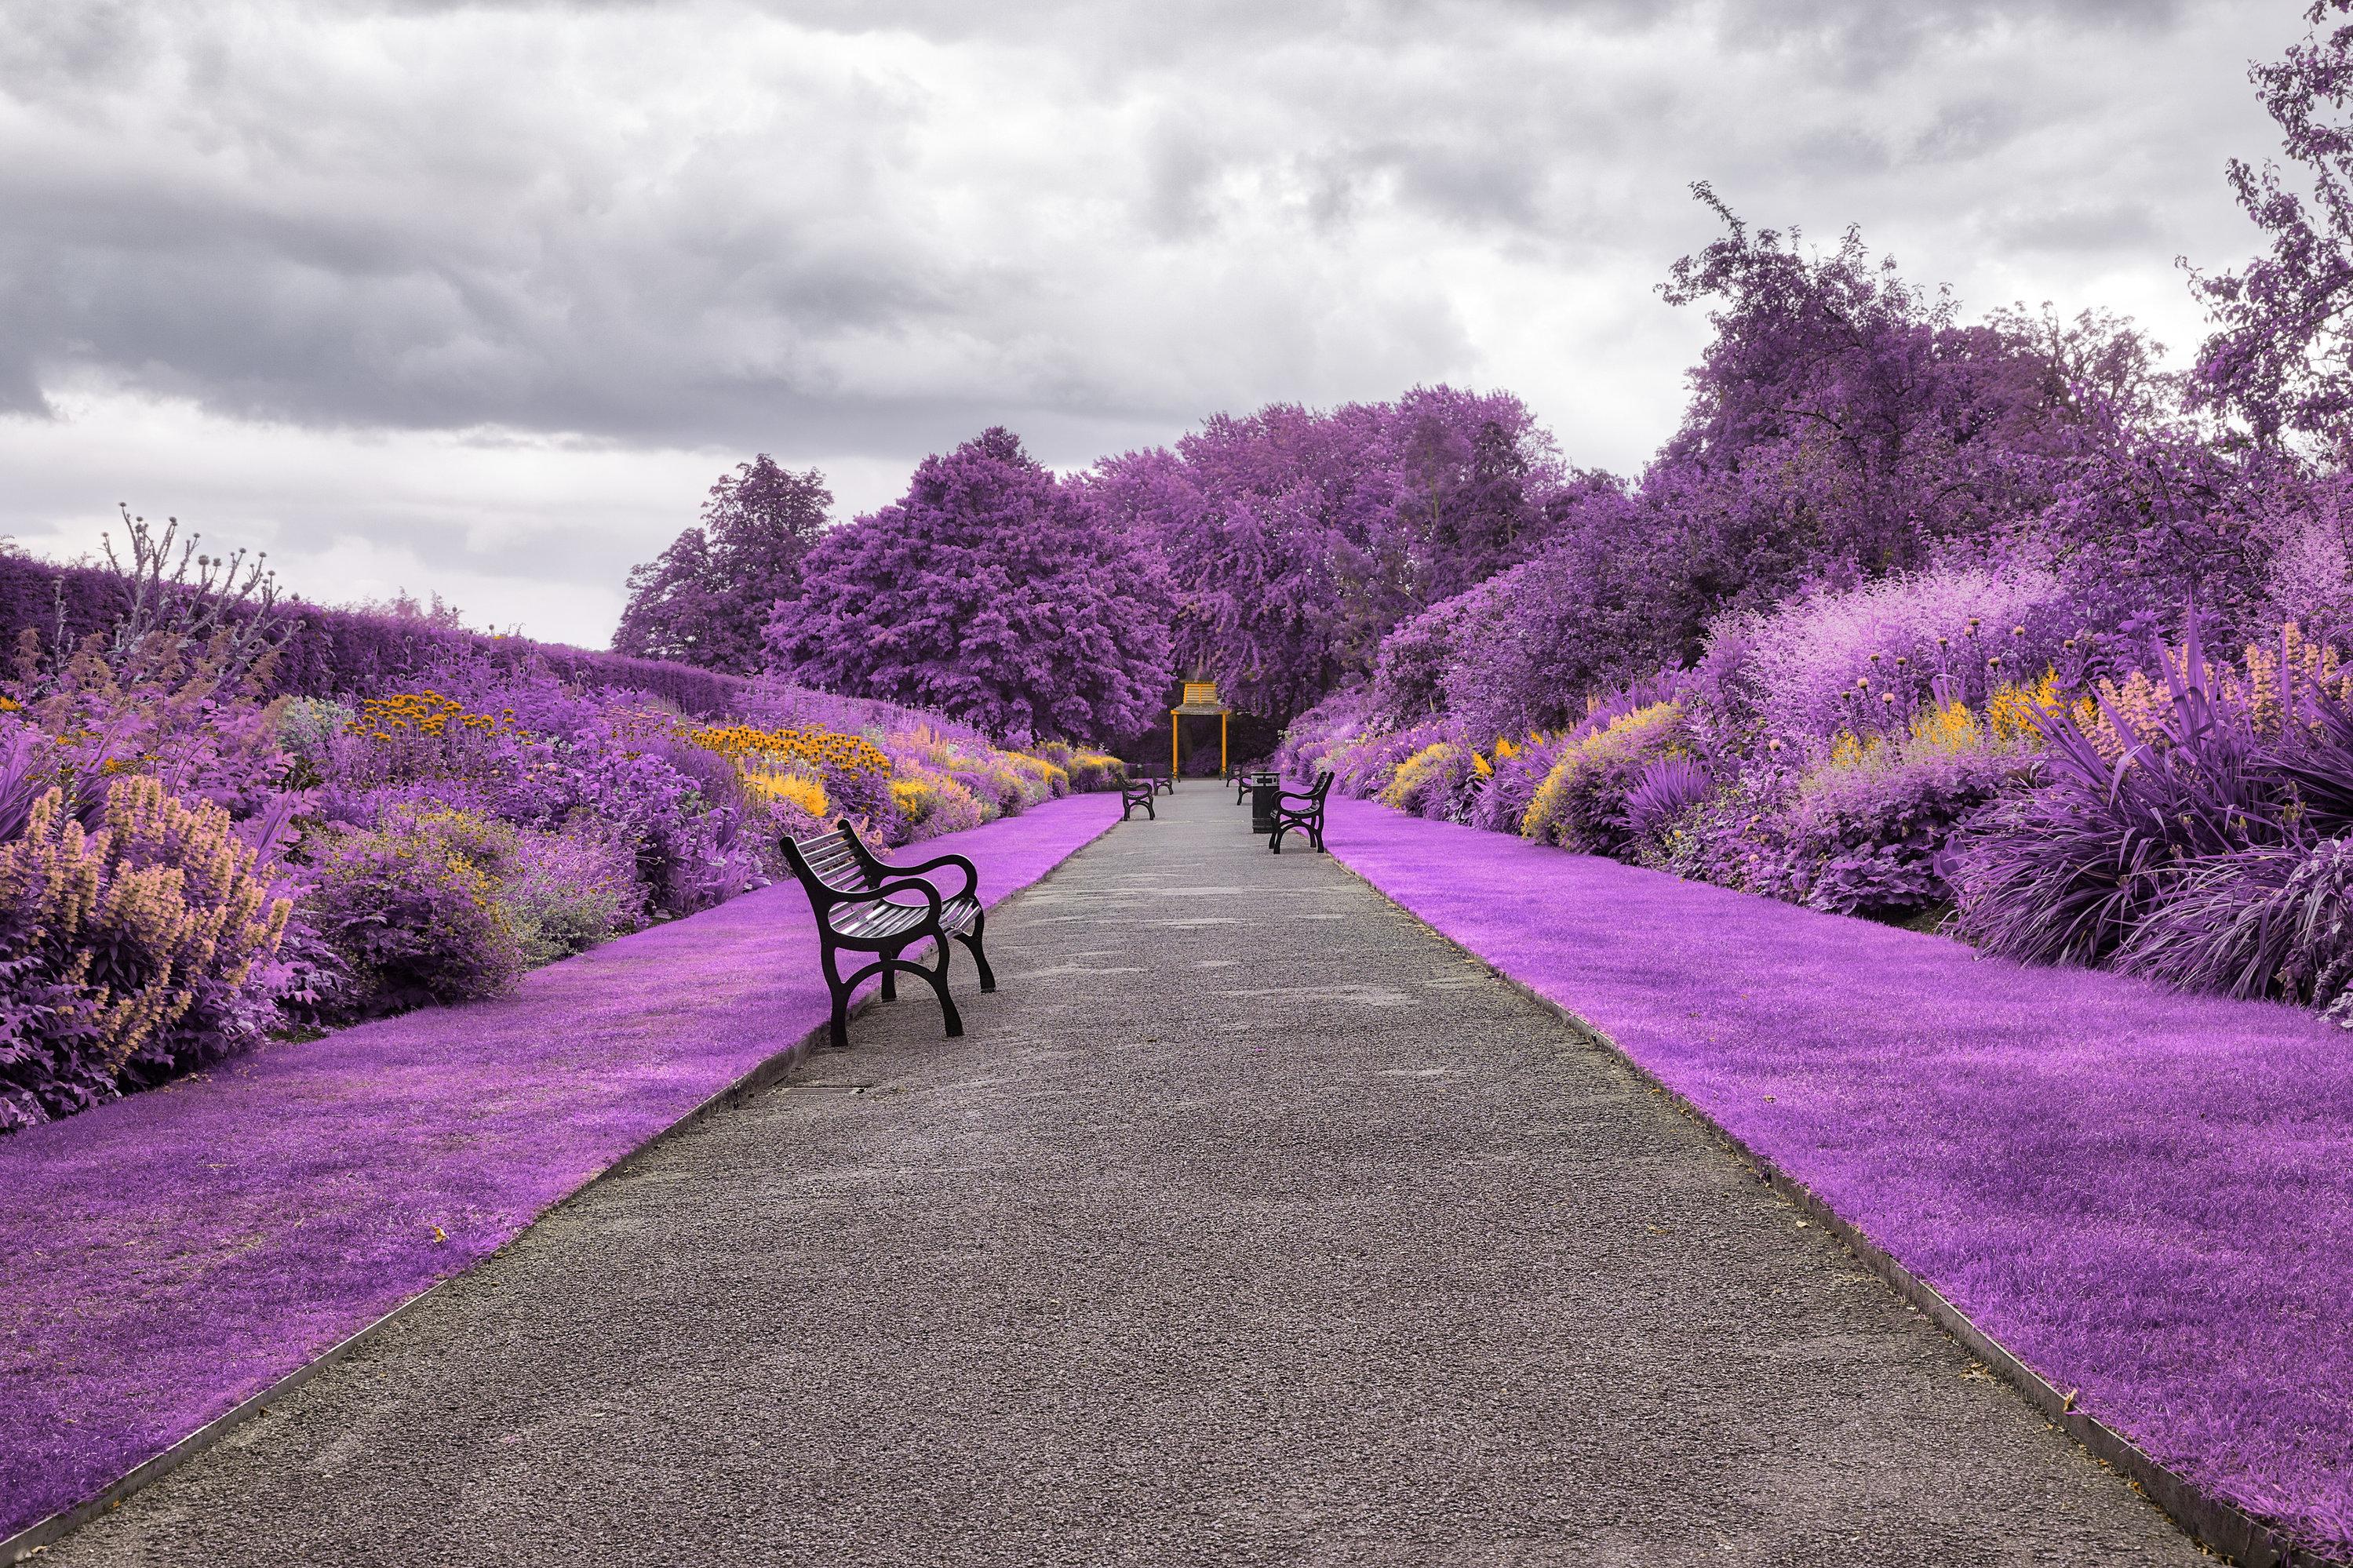 Belfast Botanic Gardens in Northern Ireland Wallpaper HD City 4K 2999x1999